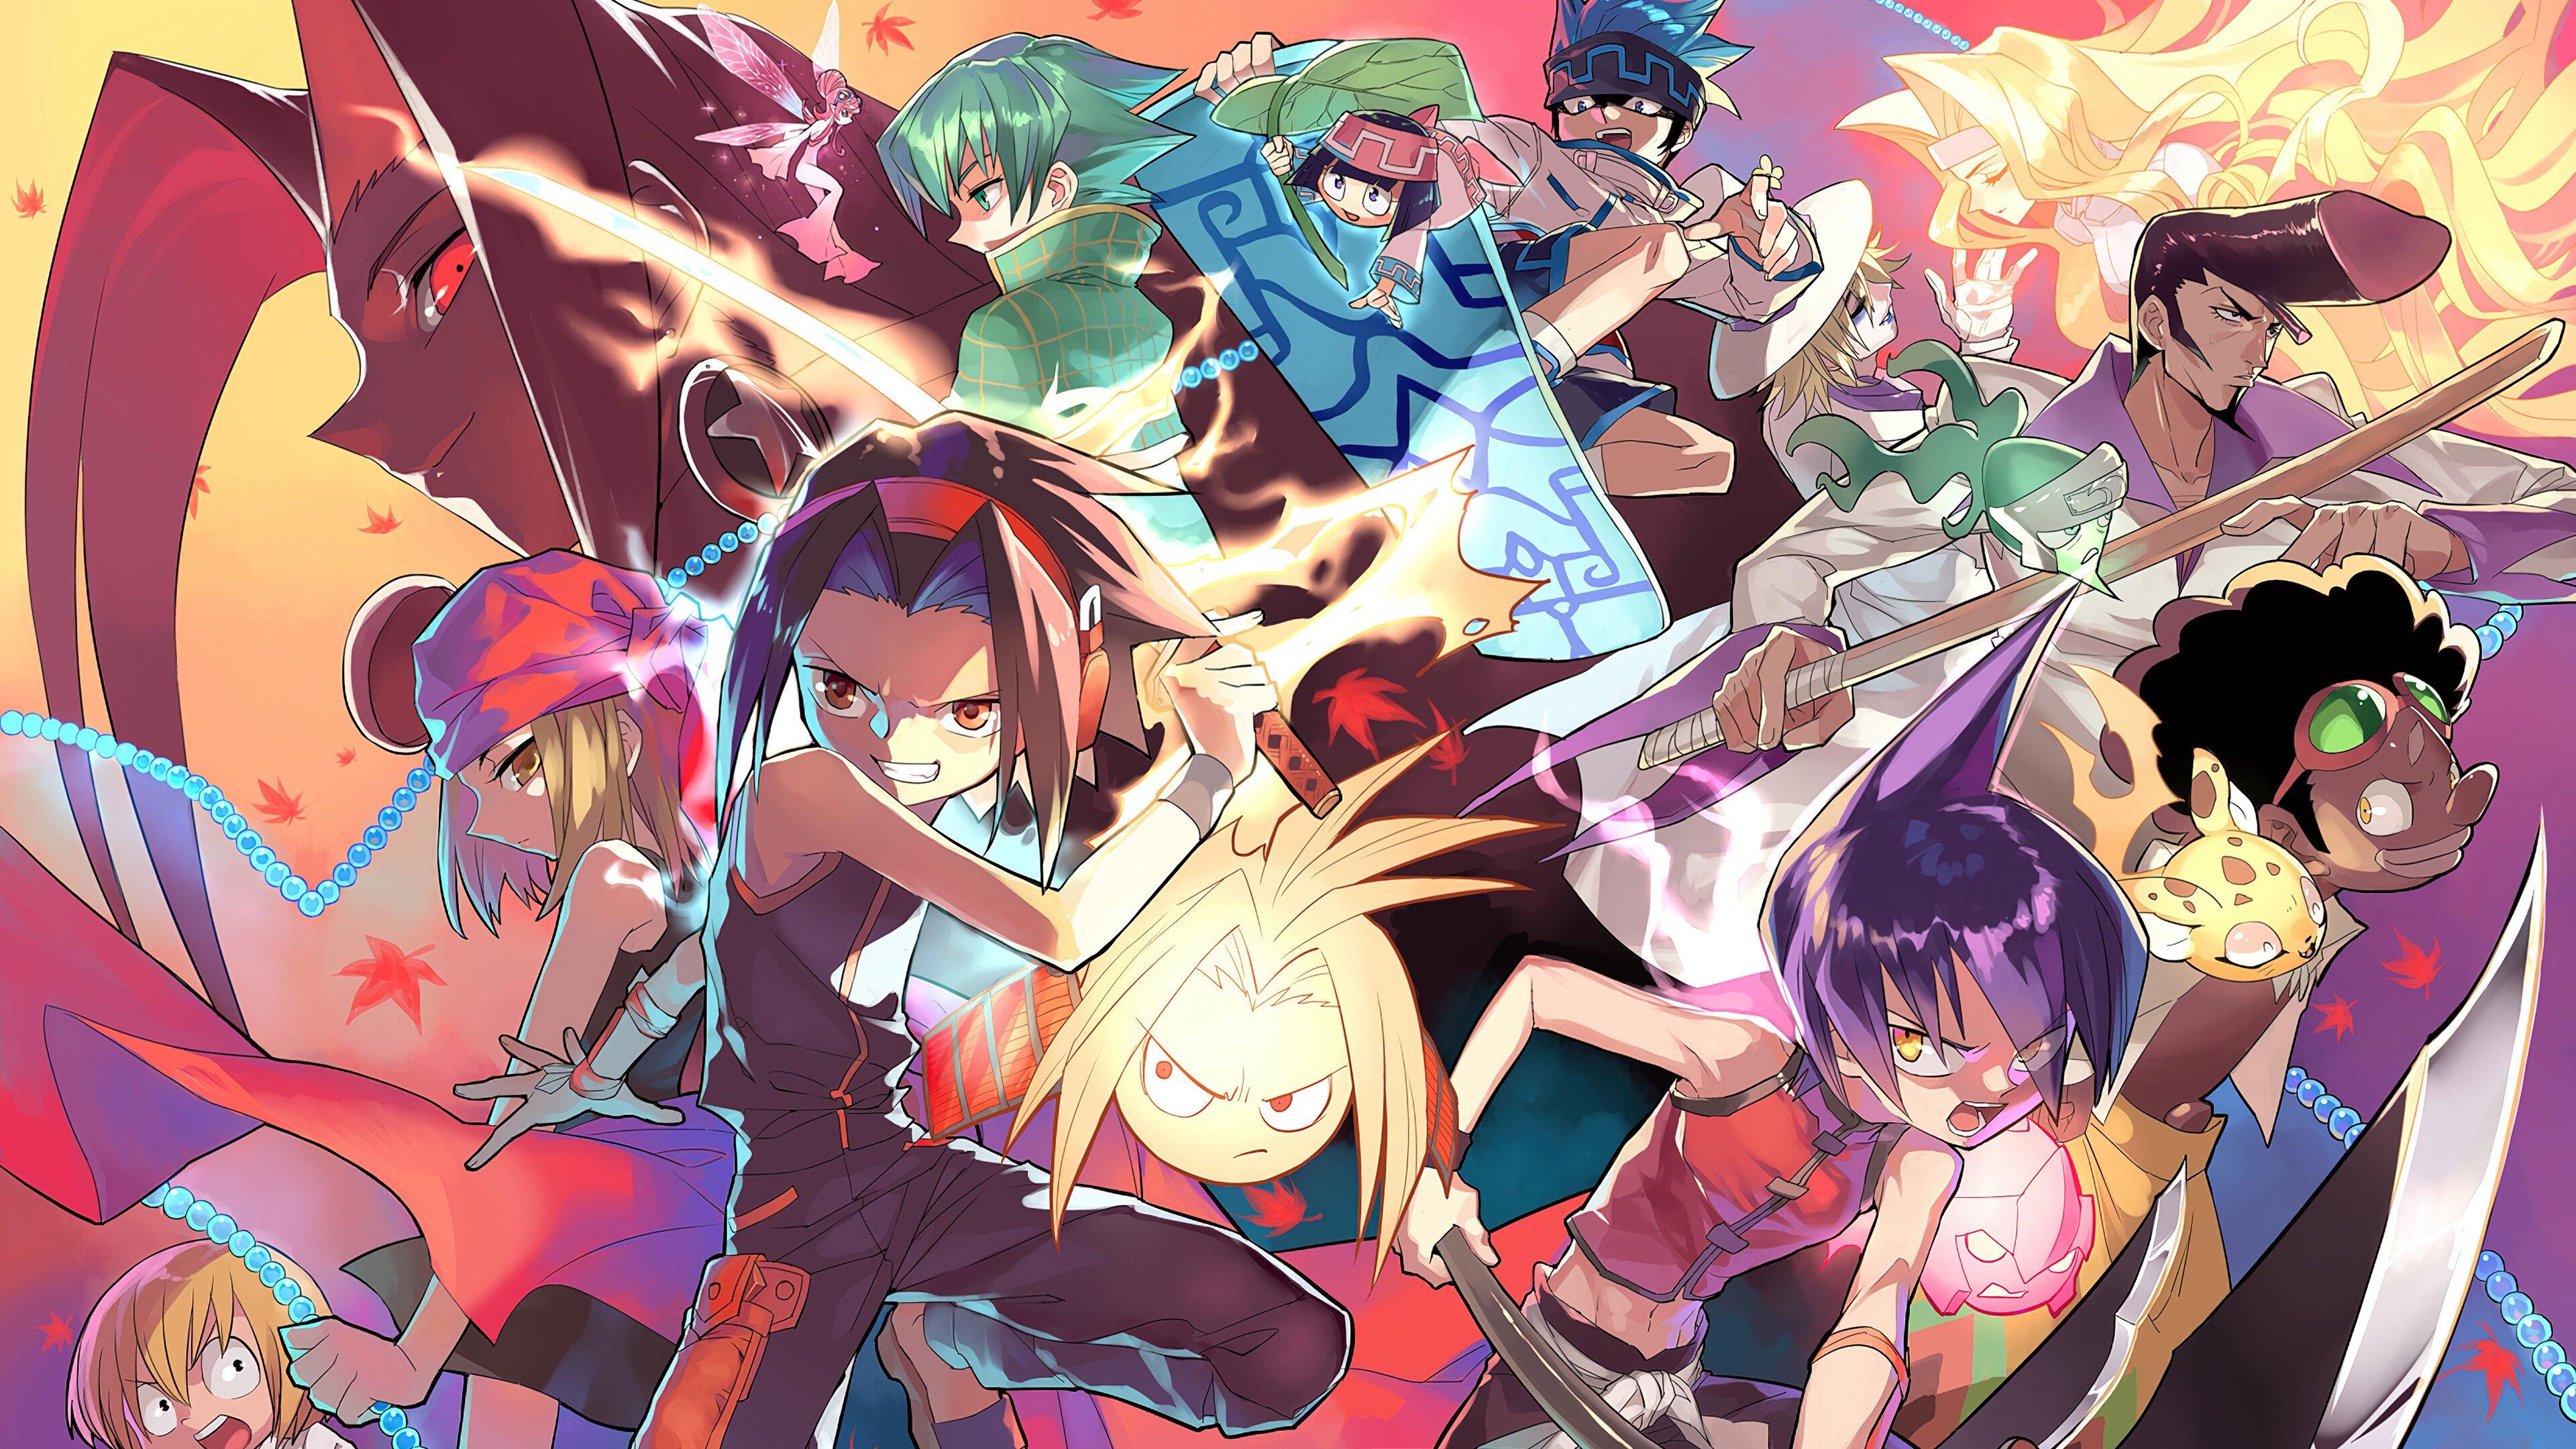 Anime Wallpaper Shaman King Characters 2021